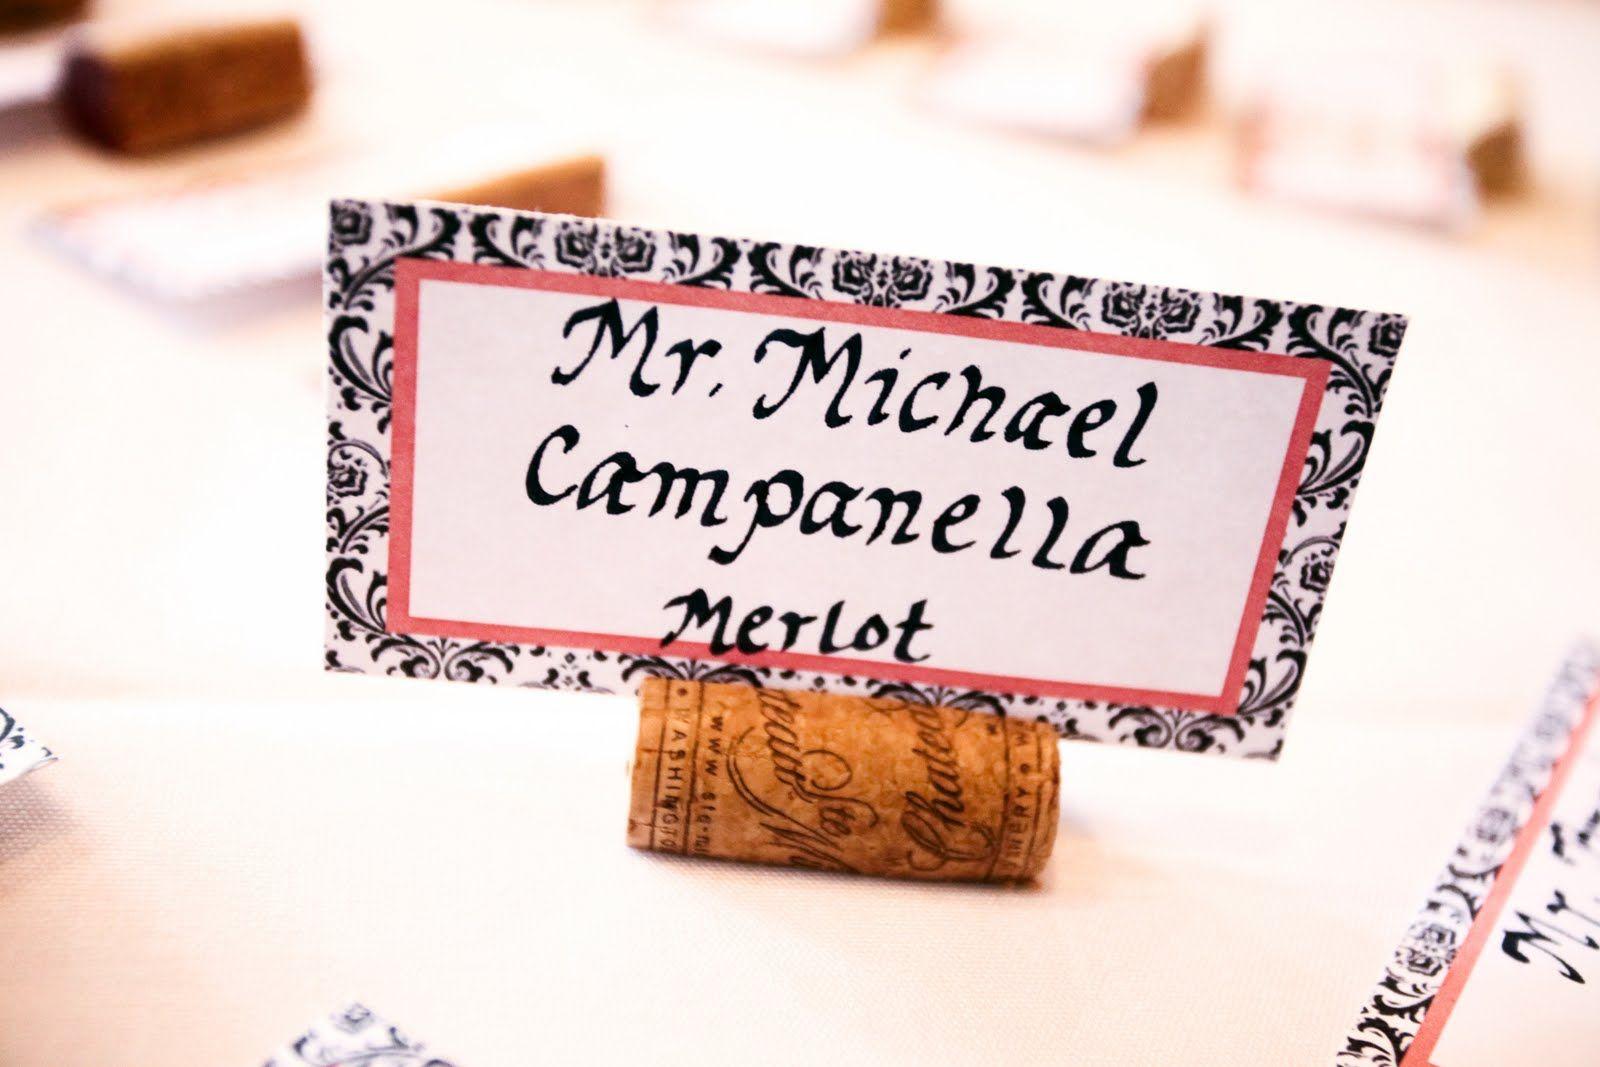 Name Cards Cute Wedding Fun Pinterest Wedding Fun And Weddings